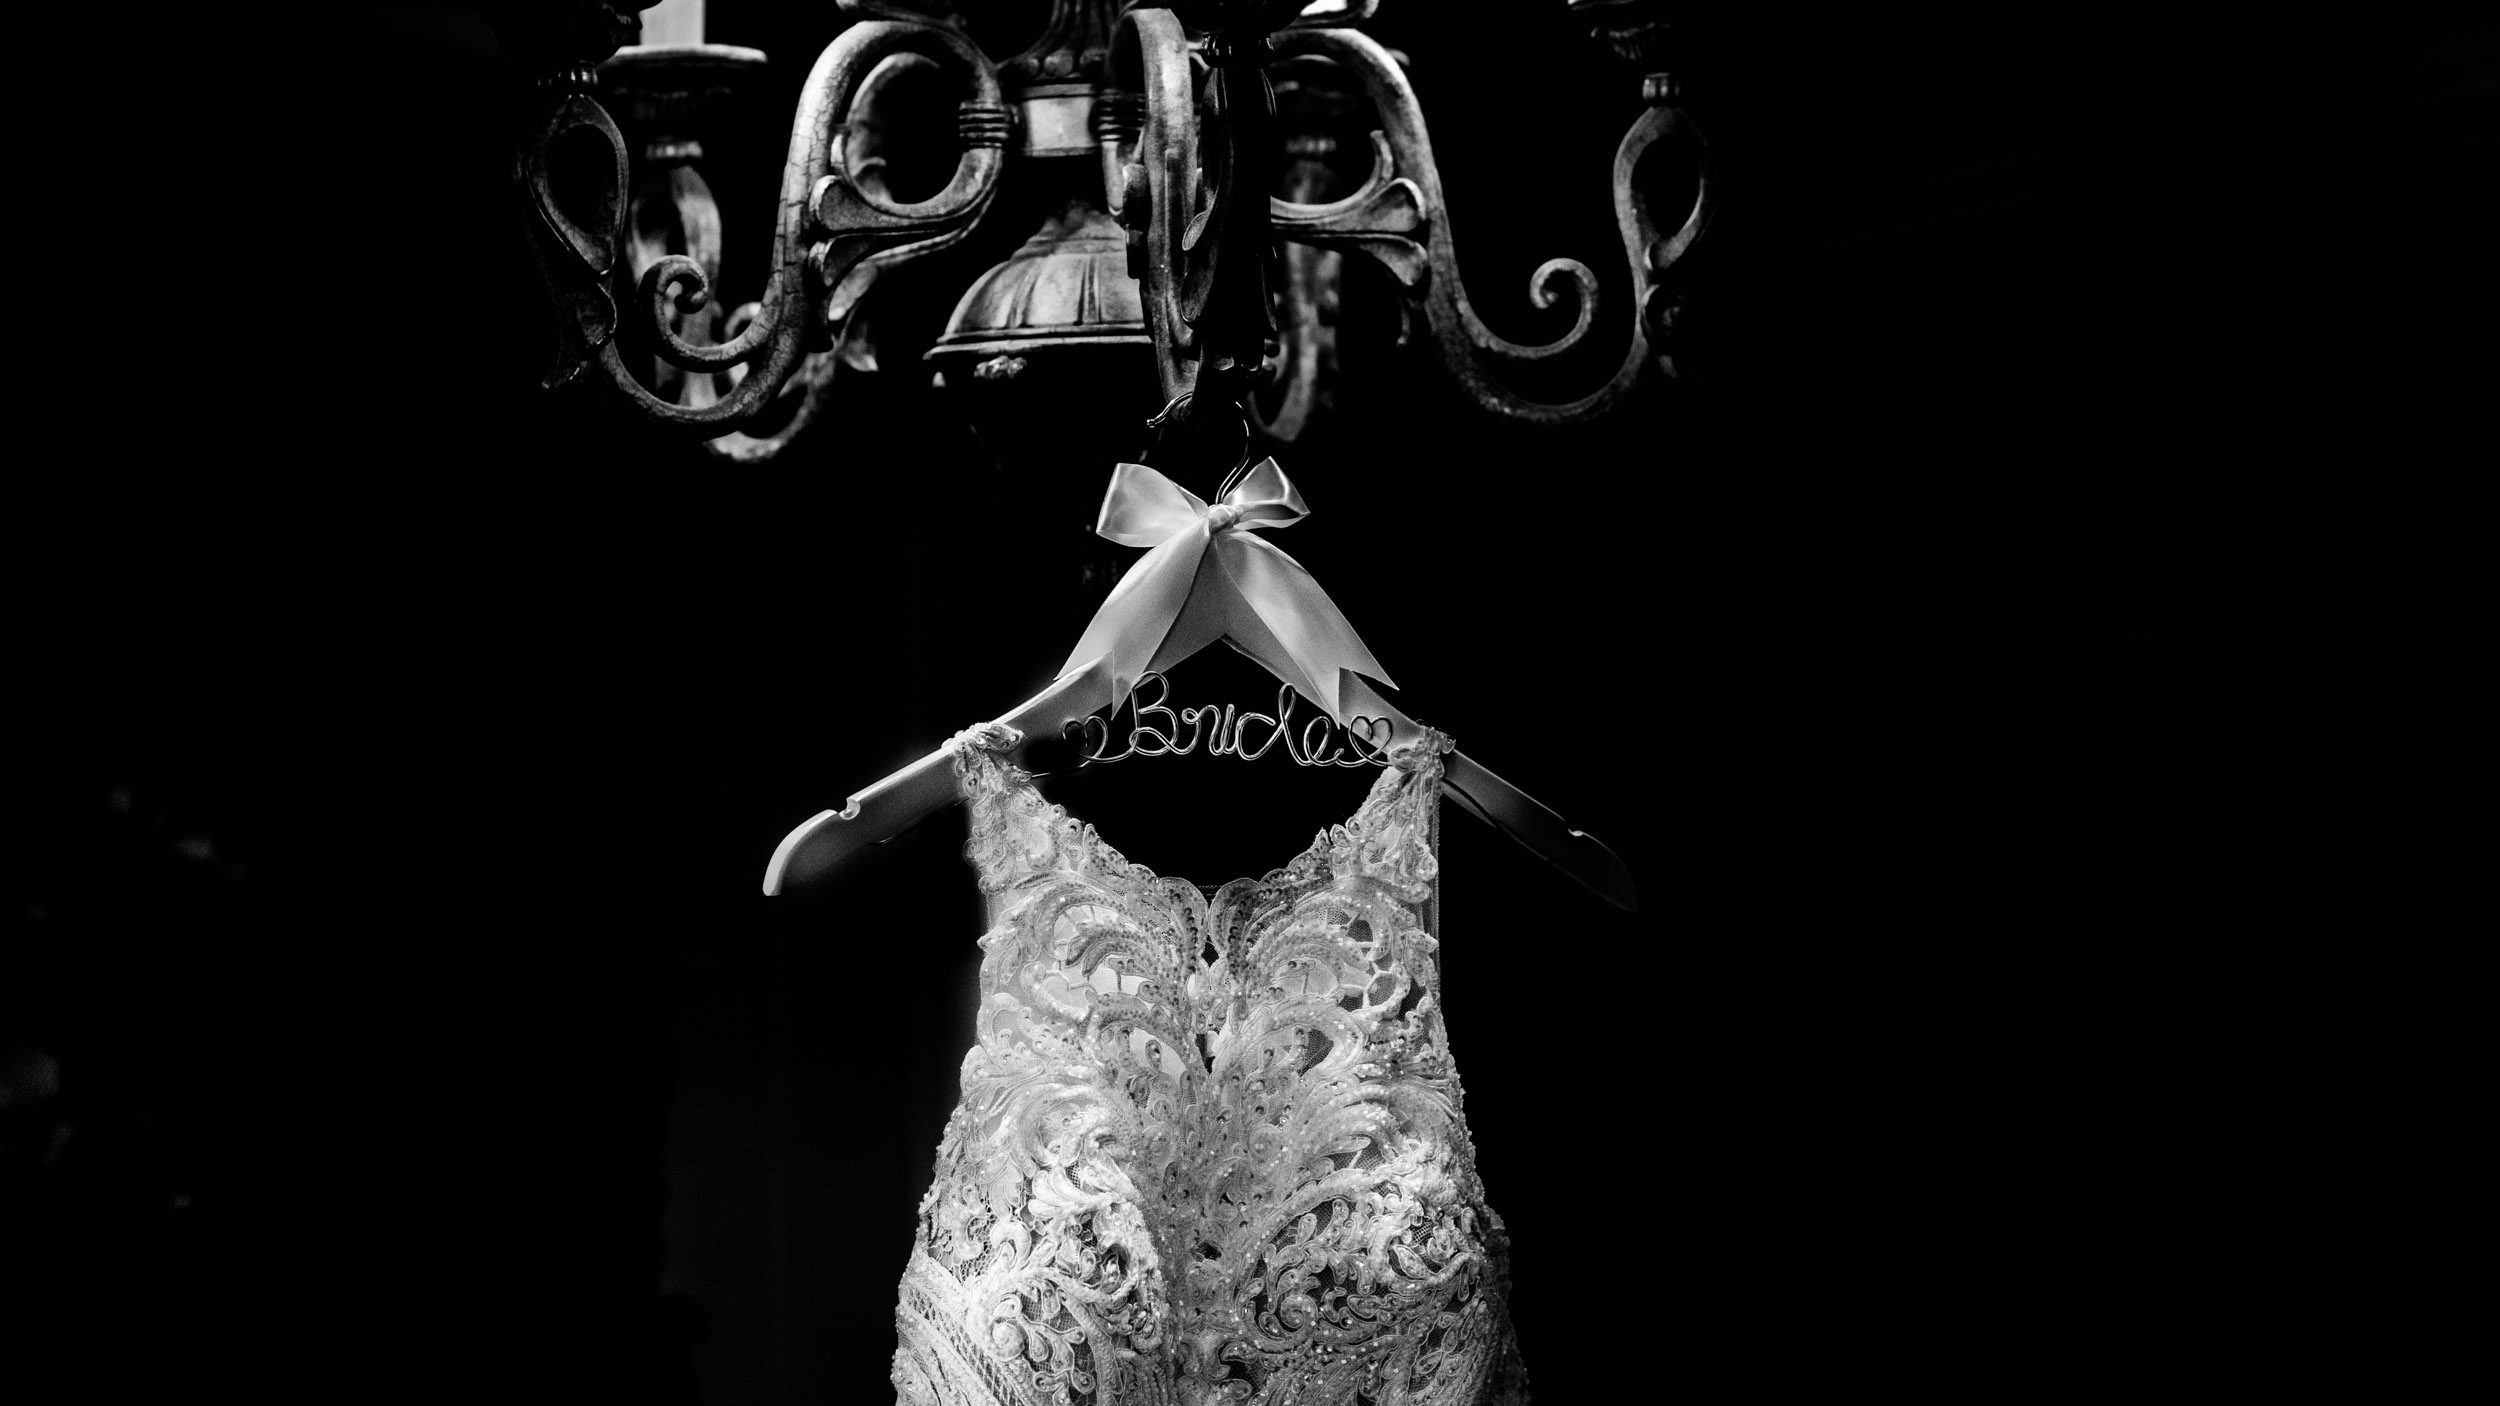 dc+metro+wedding+photographer+vadym+guliuk+photography+weddings+dress-2024.jpg